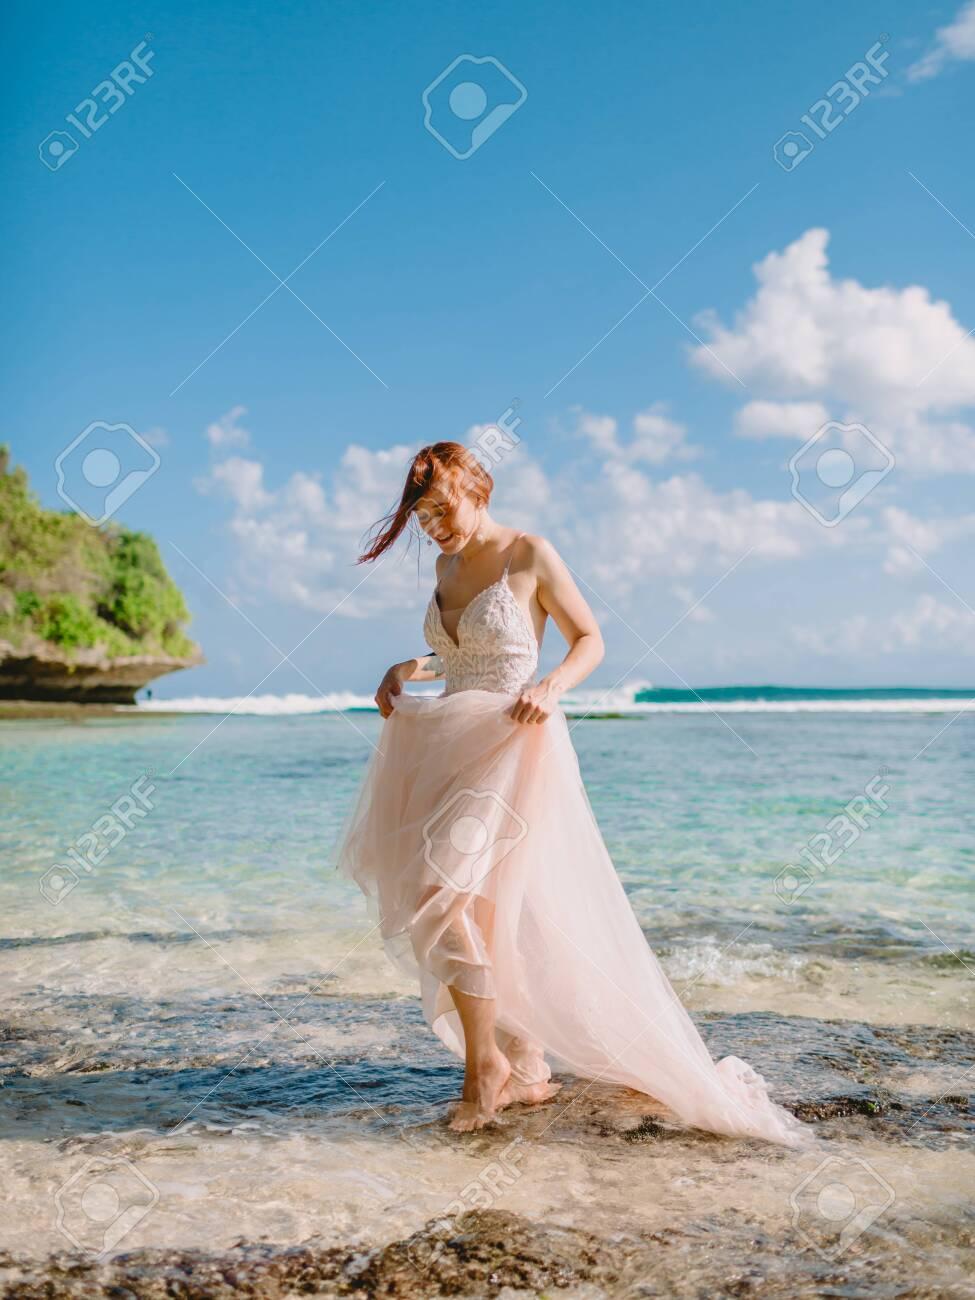 July 5, 2020. Bali, Indonesia. Wedding day of red head bride in wedding dress at tropical beach. Happy wedding in tropical Bali - 154116553